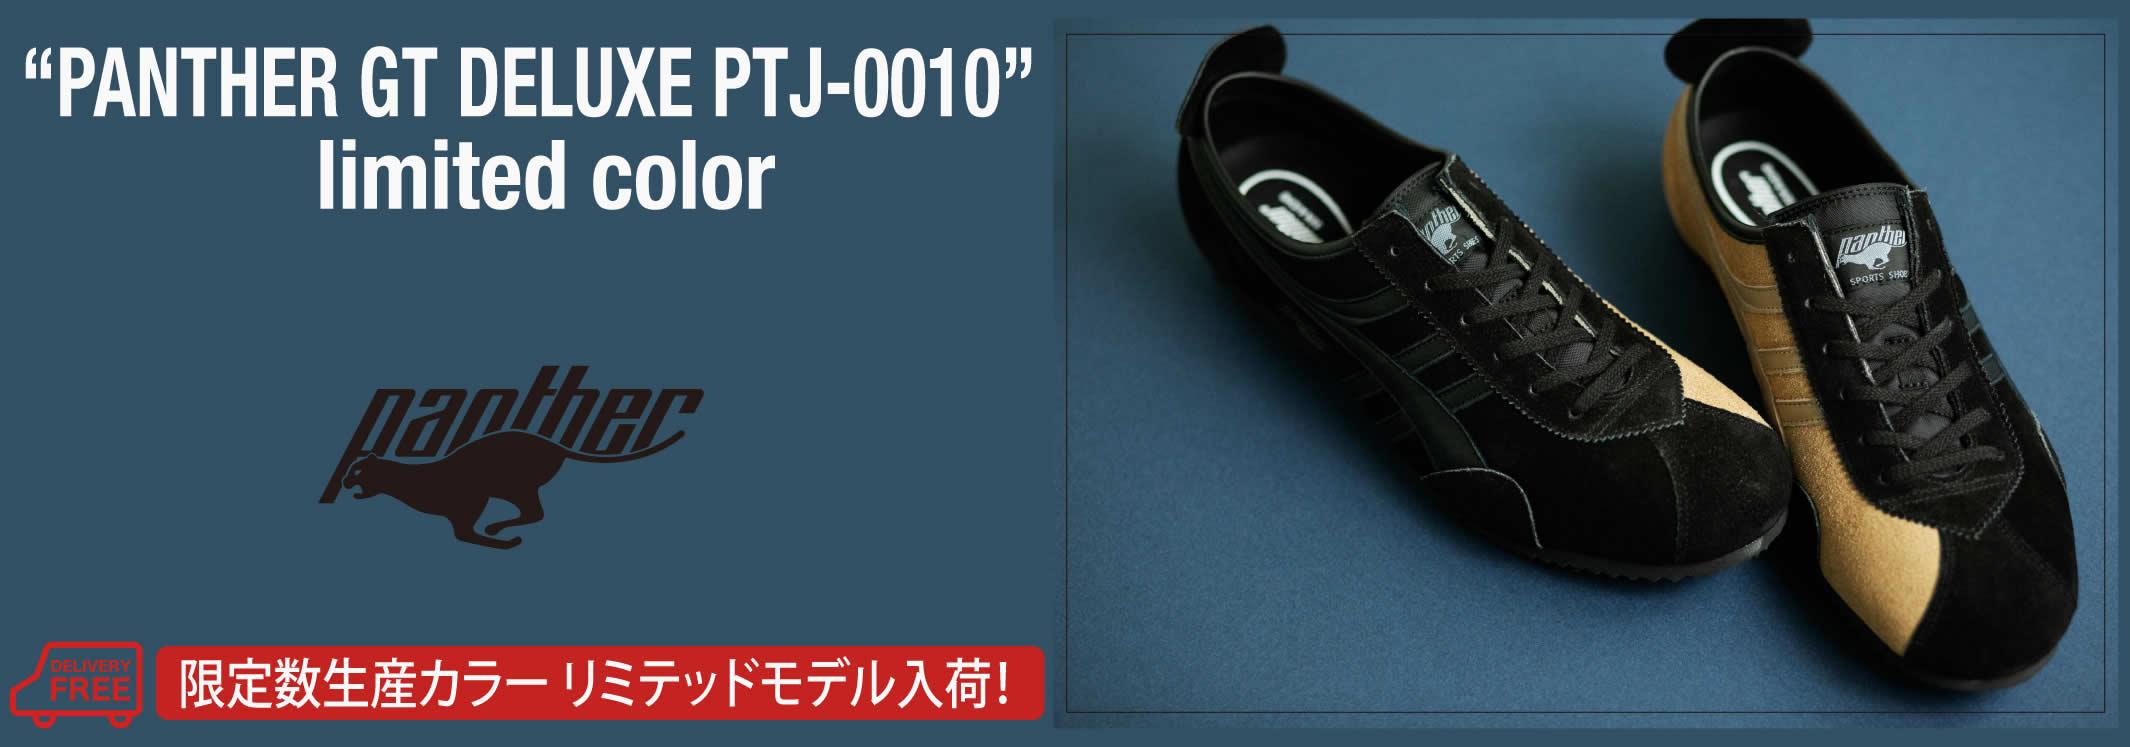 08-mv01-1-1